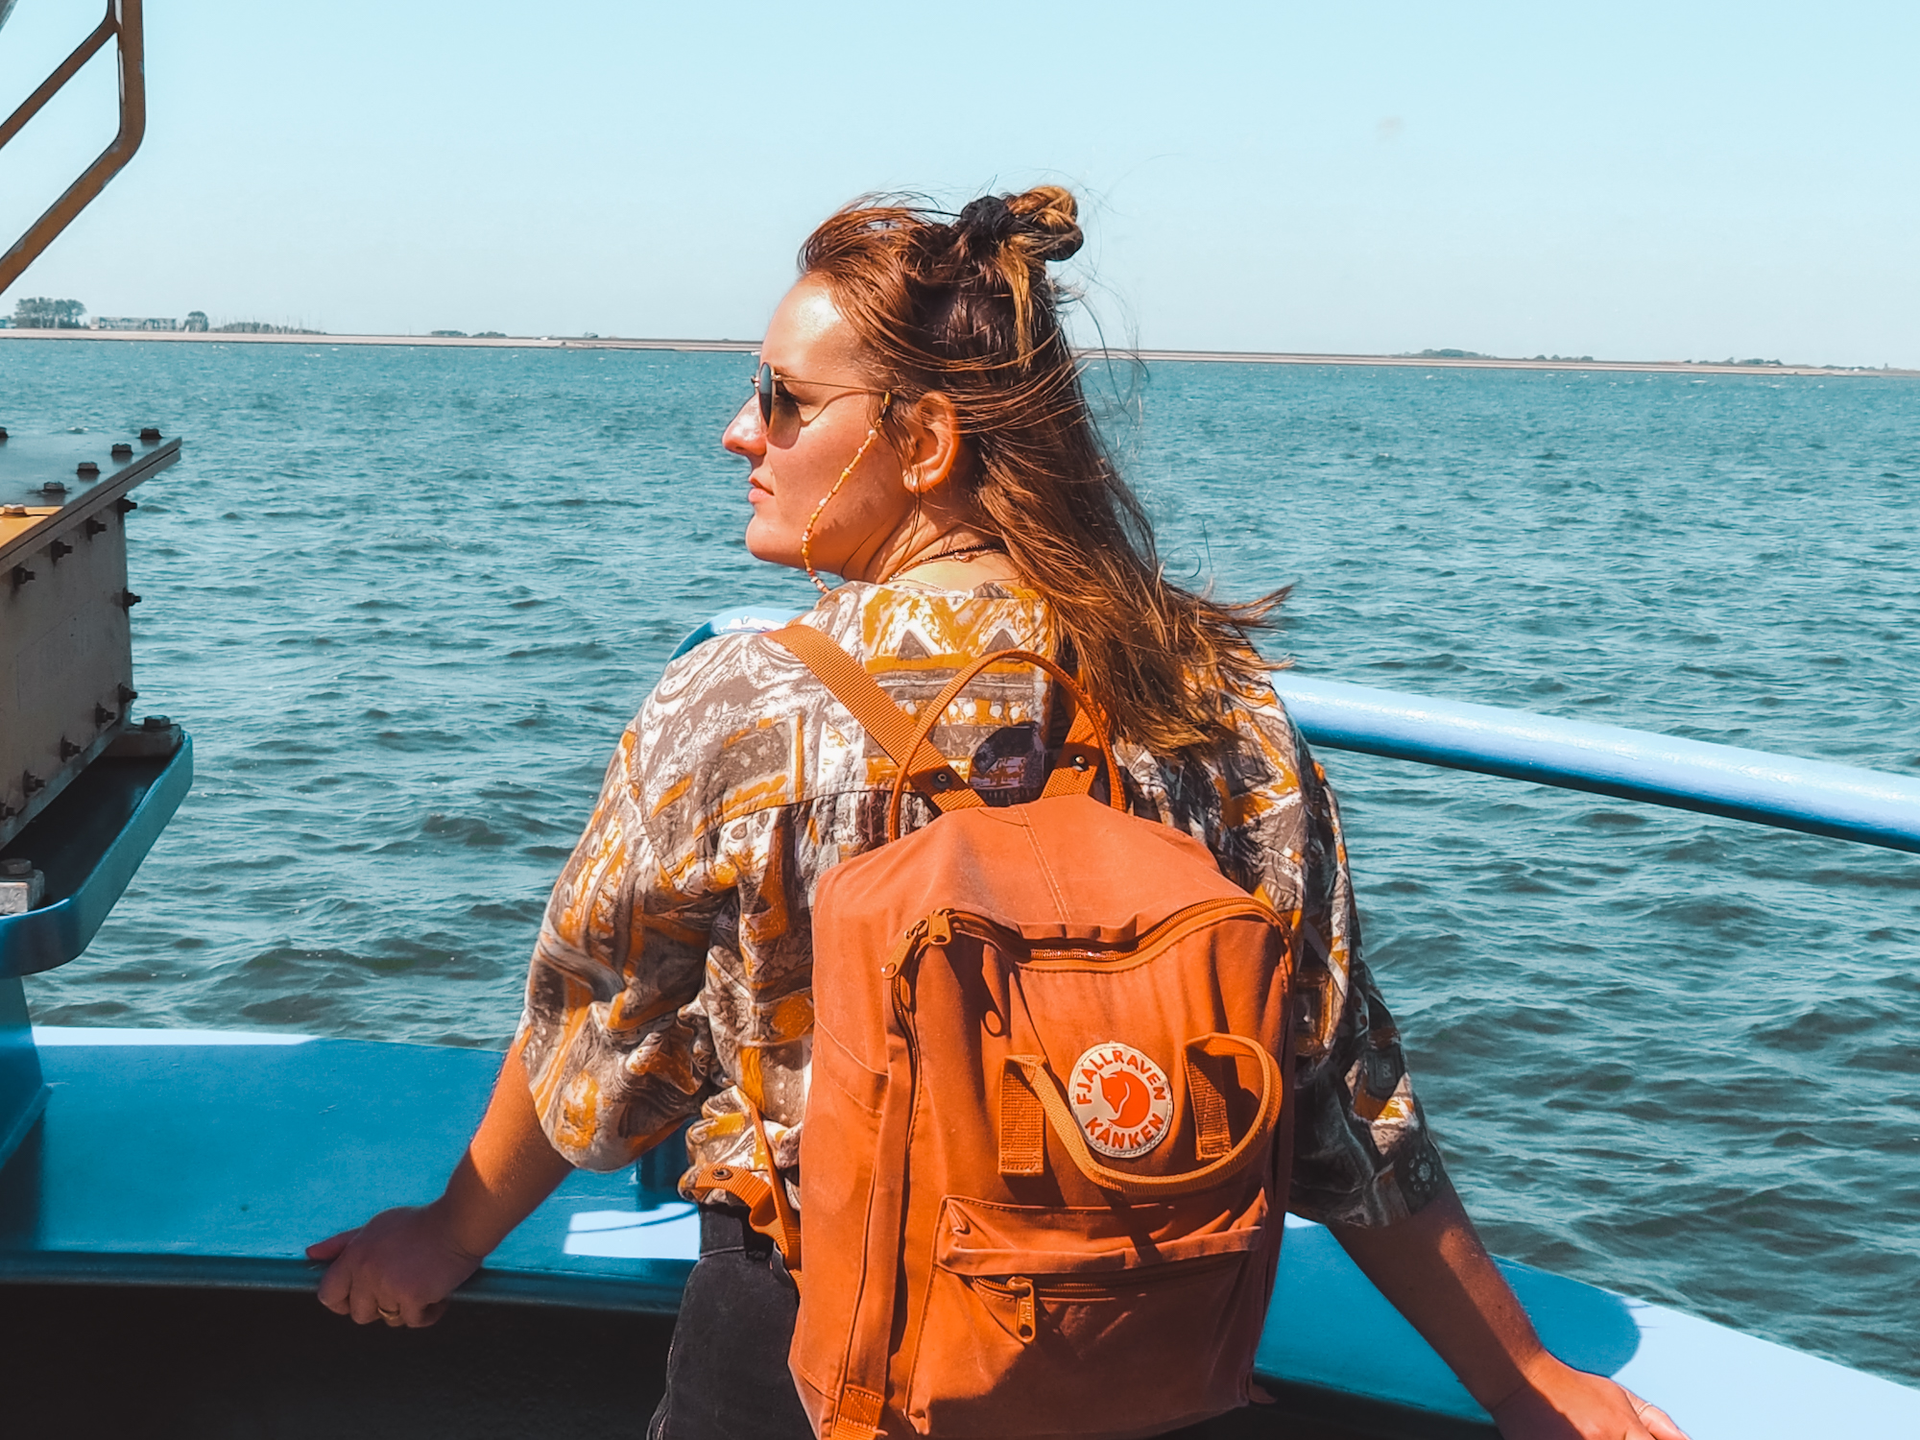 Boottocht Garnalenboot Zeehonden spotten Texel Oudeschild Waddenzee